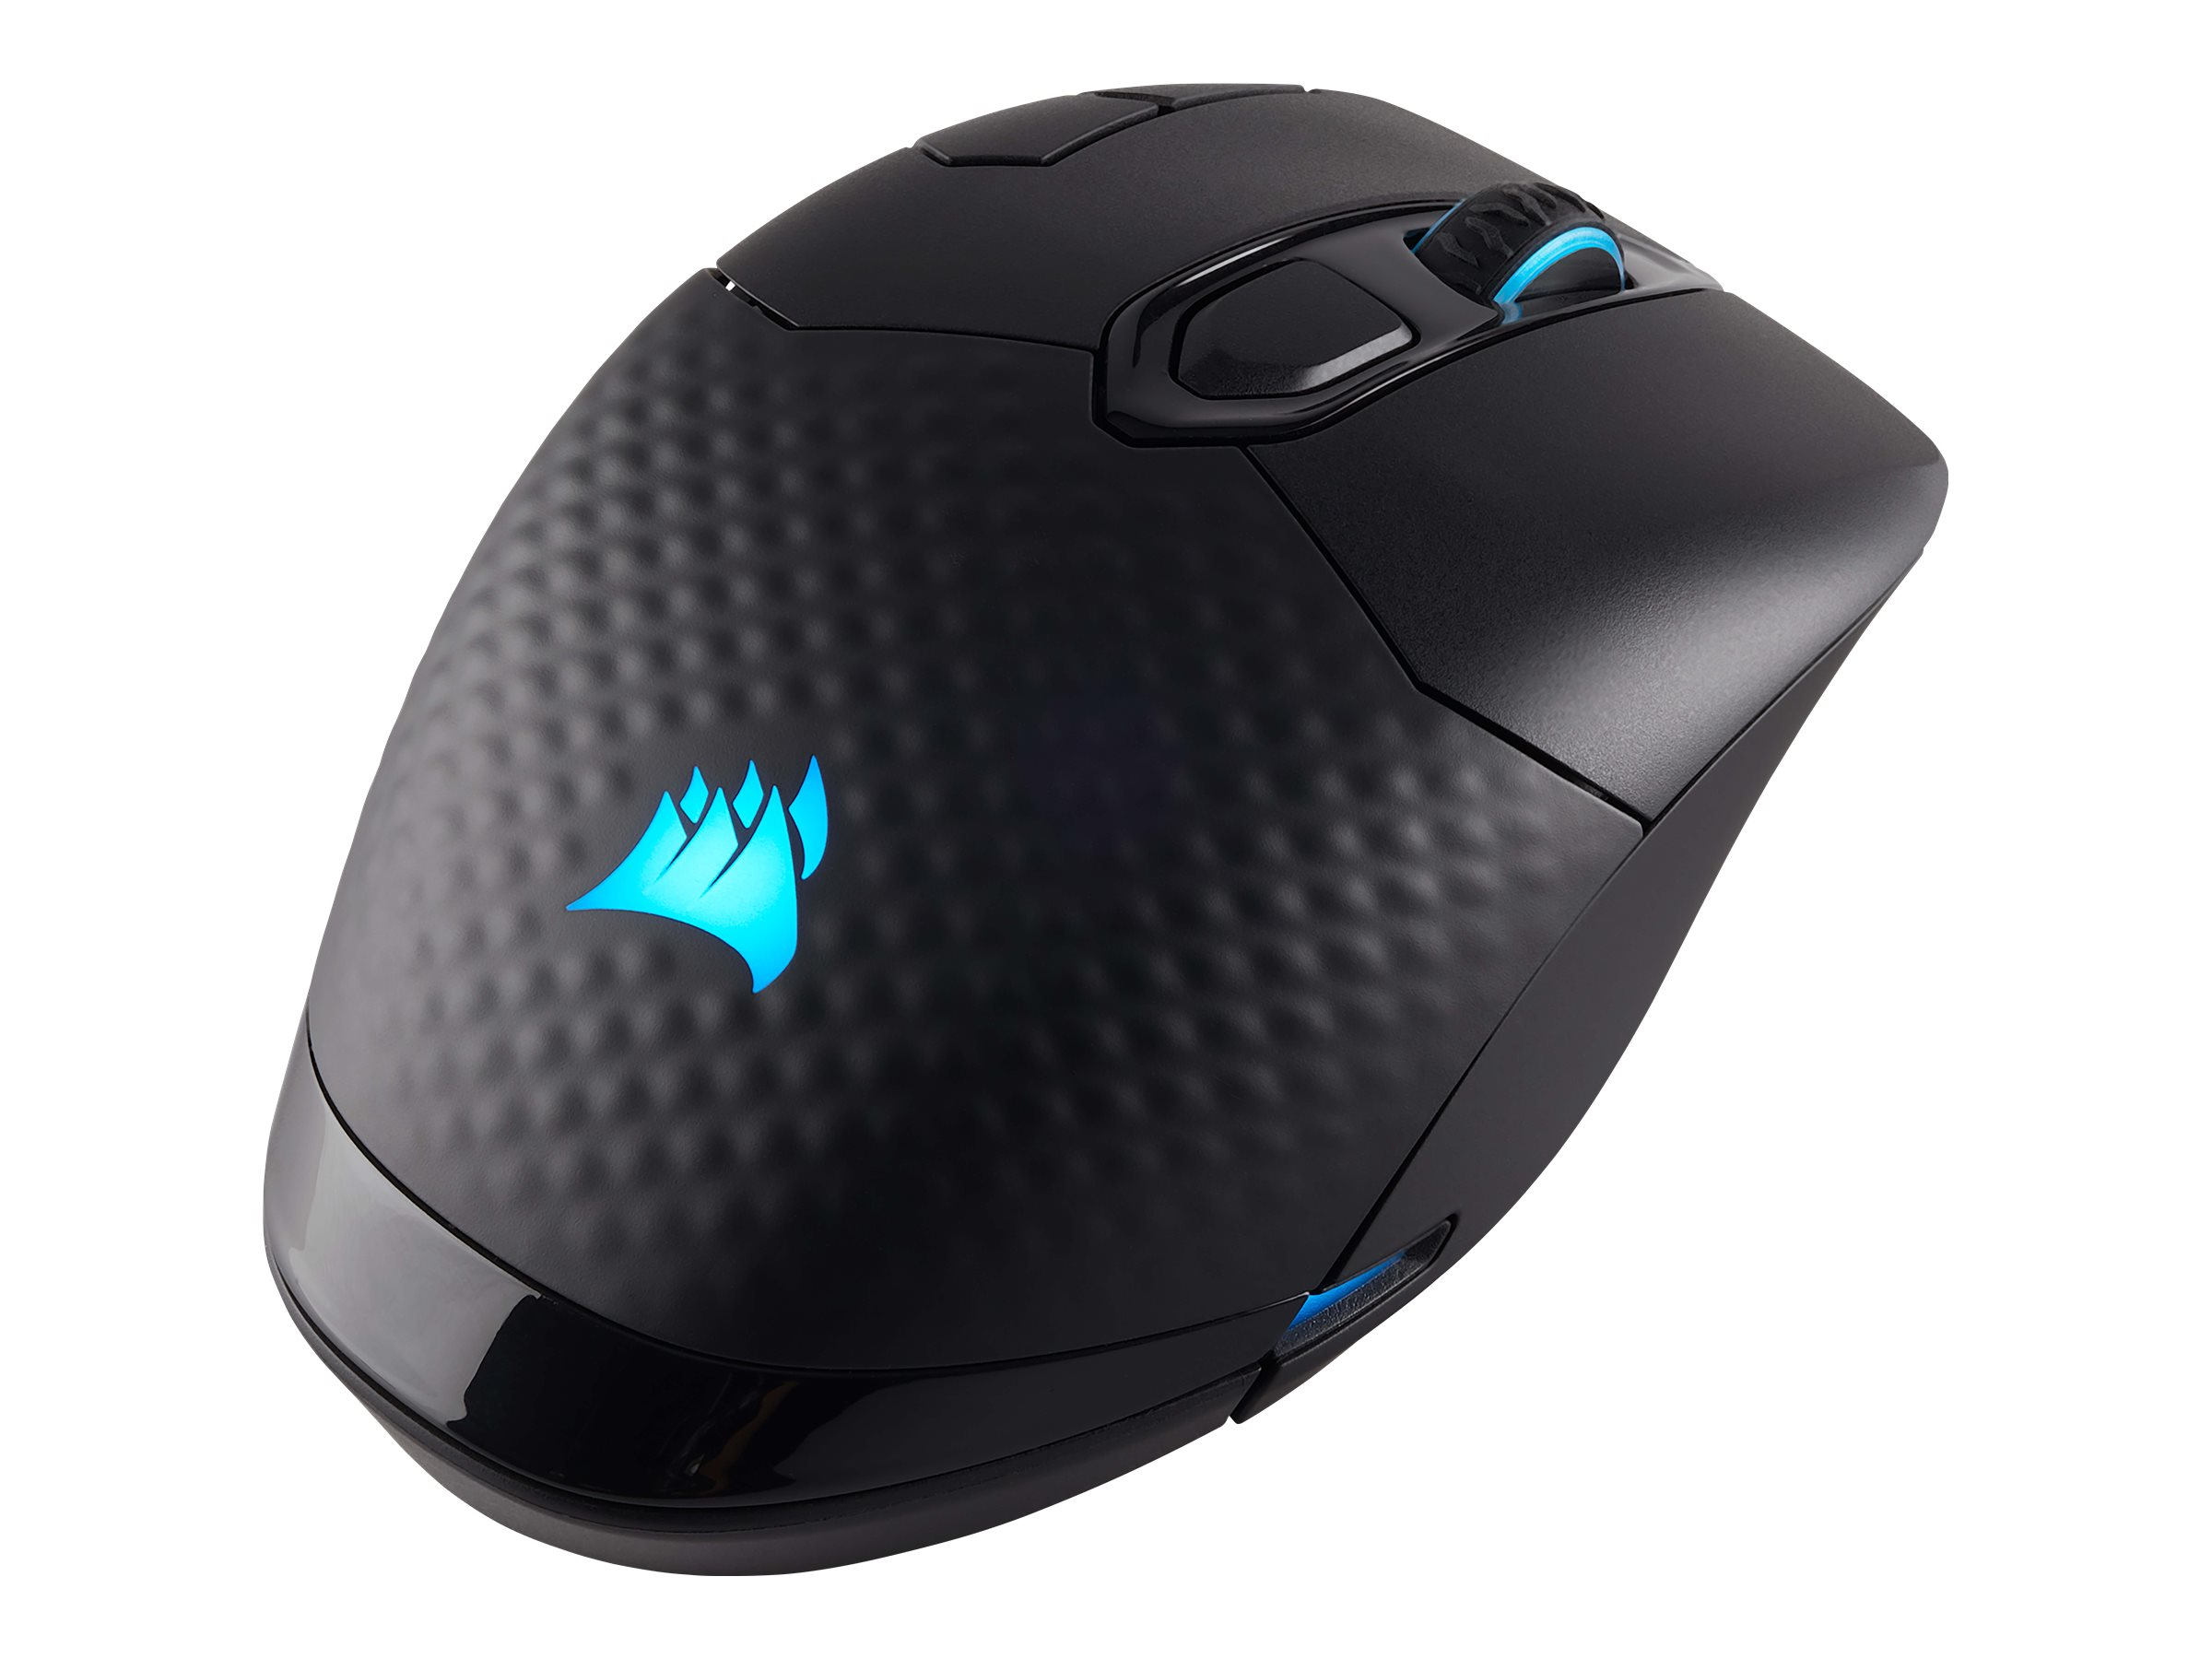 CORSAIR Gaming DARK CORE RGB SE - Maus - optisch - 9 Tasten - kabellos, kabelgebunden - Bluetooth 4.2 LE